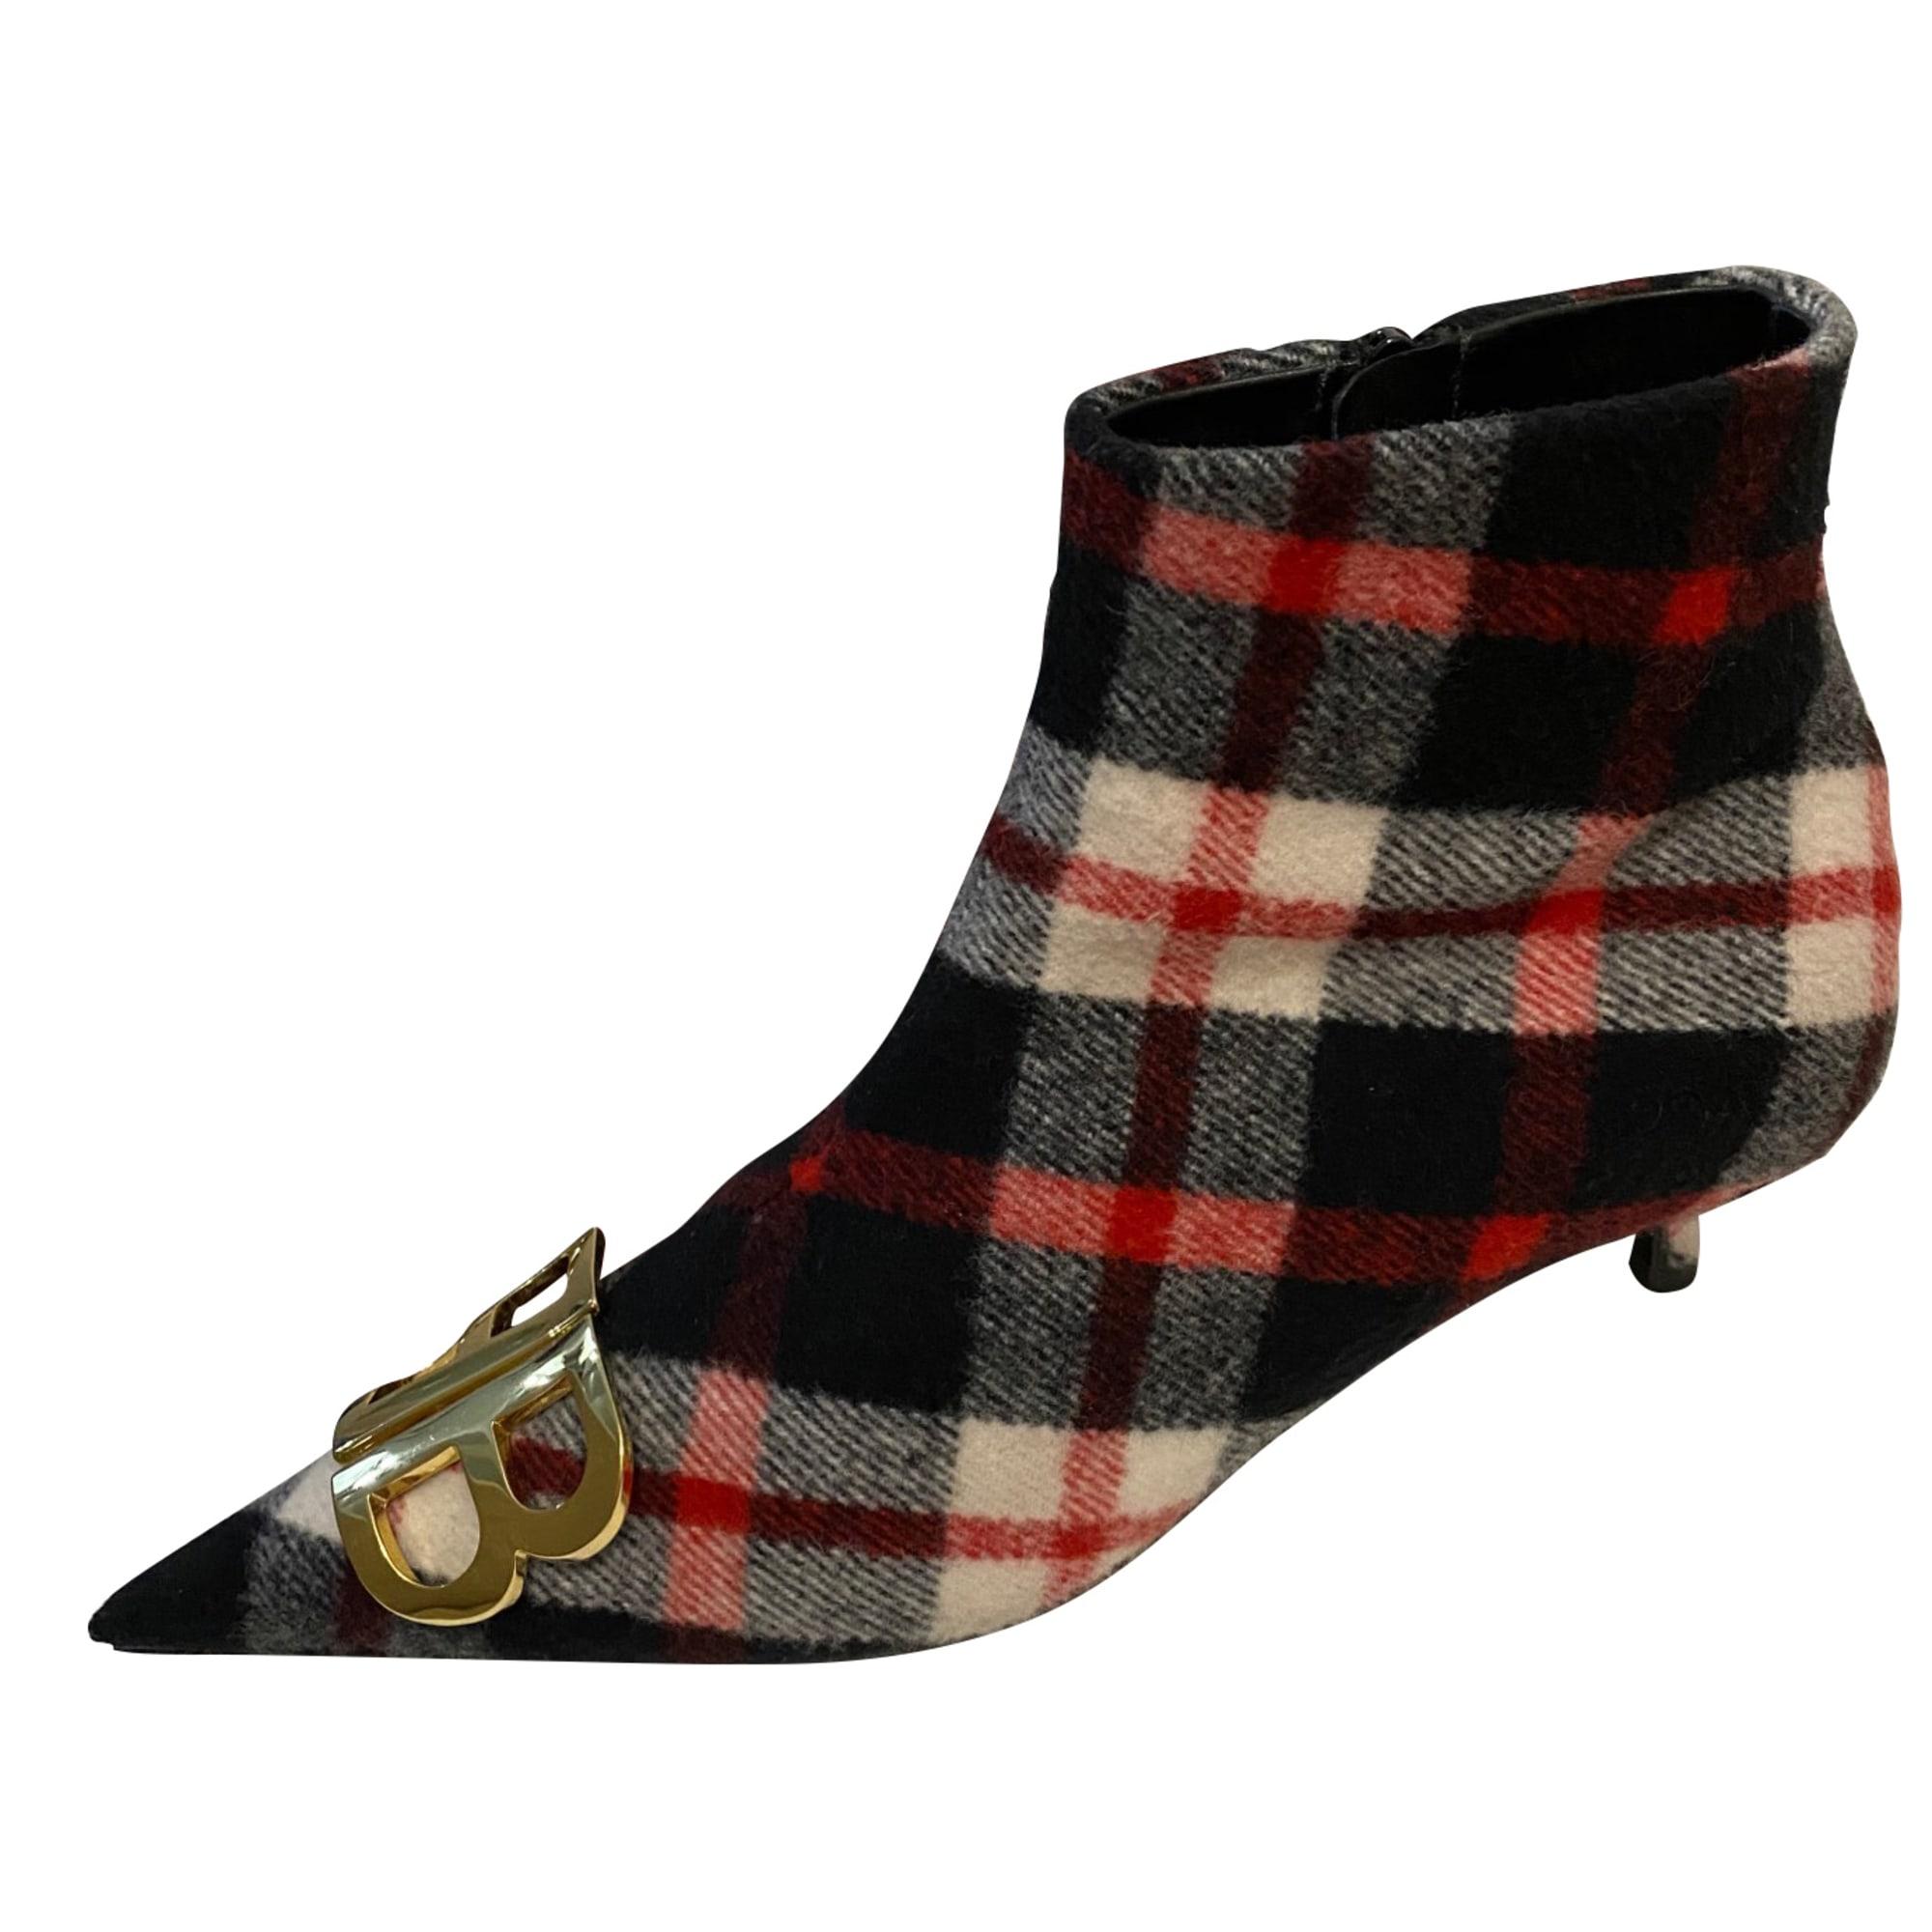 High Heel Ankle Boots BALENCIAGA Knife Red, burgundy